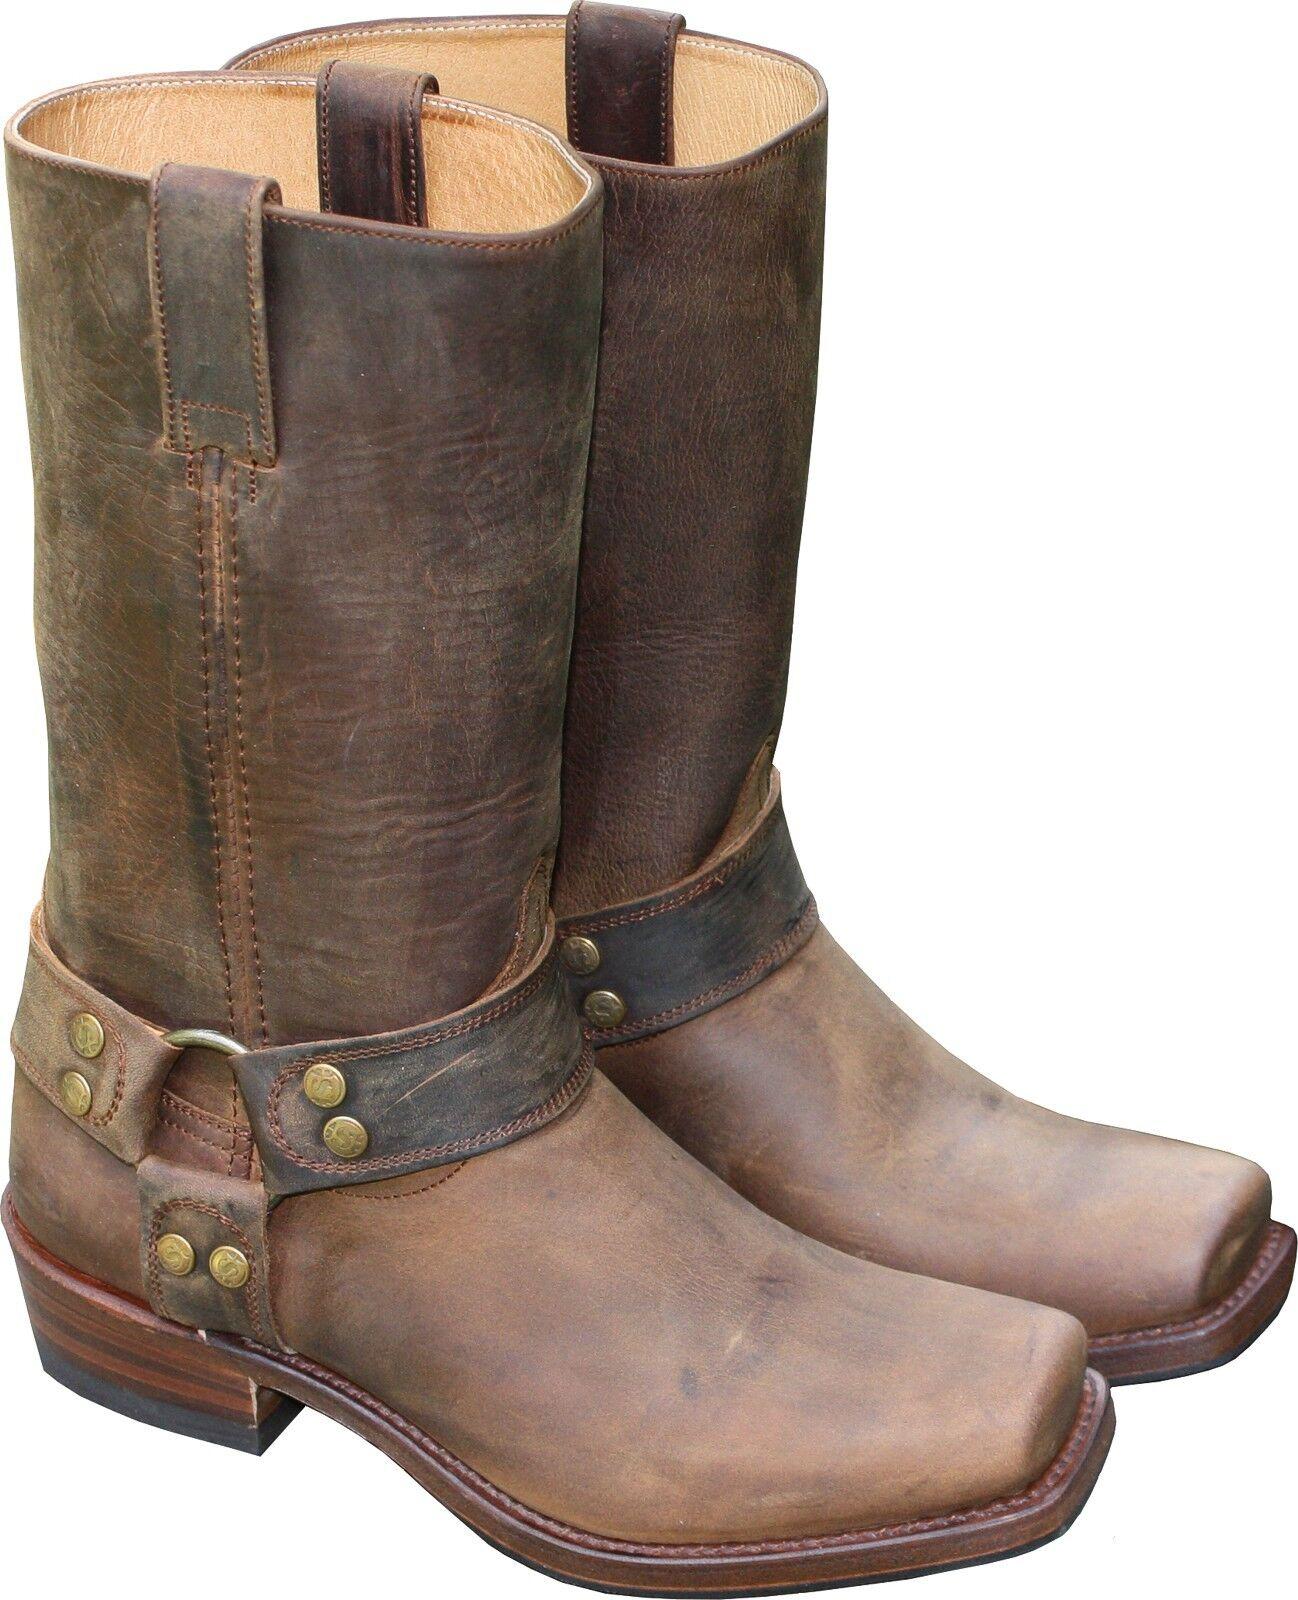 Sendra Bottes Cuir Cowboy Biker western bottes marron short Cut Country NEUF